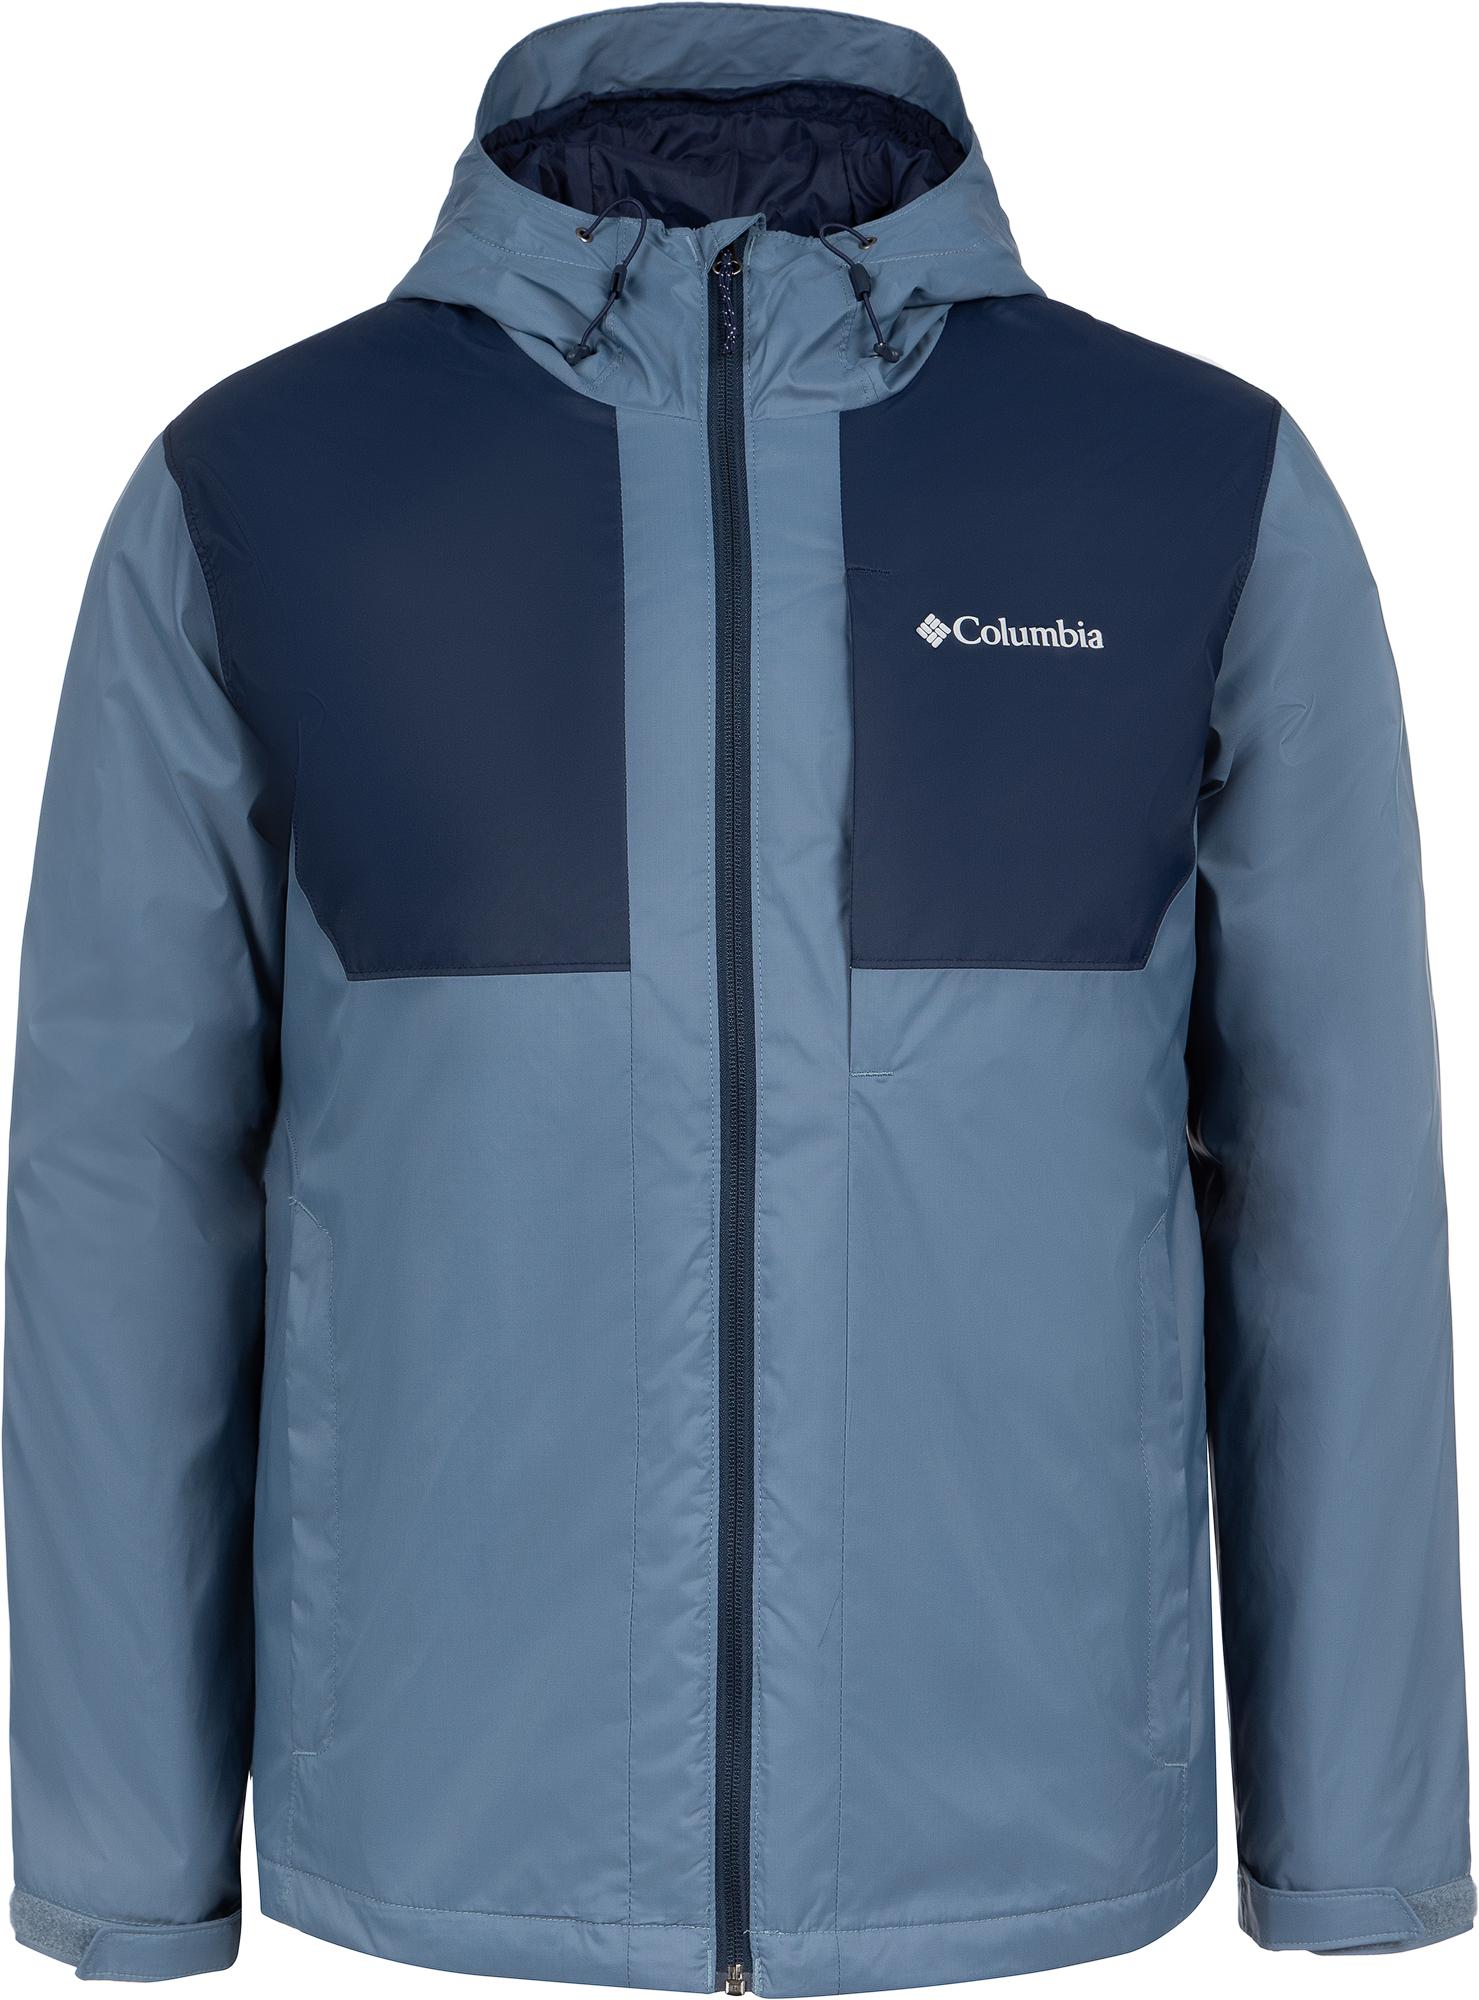 Columbia Куртка утепленная мужская Columbia Straight Line™, размер 50-52 columbia куртка утепленная мужская columbia eagles call